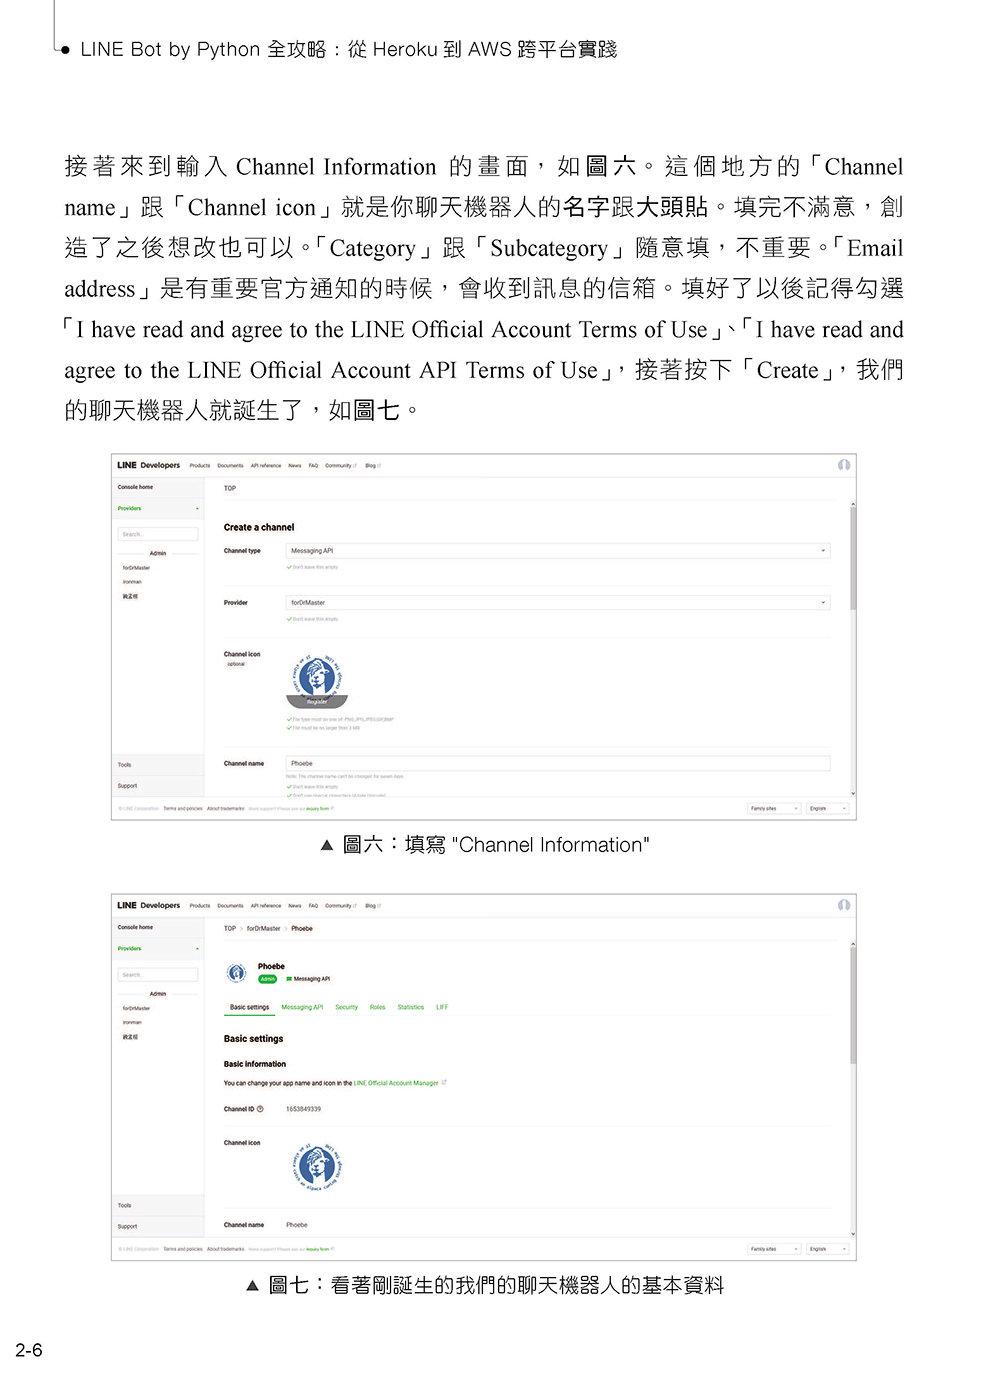 LINE Bot by Python 全攻略:從 Heroku 到 AWS 跨平台實踐 (iT邦幫忙鐵人賽系列書)-preview-6